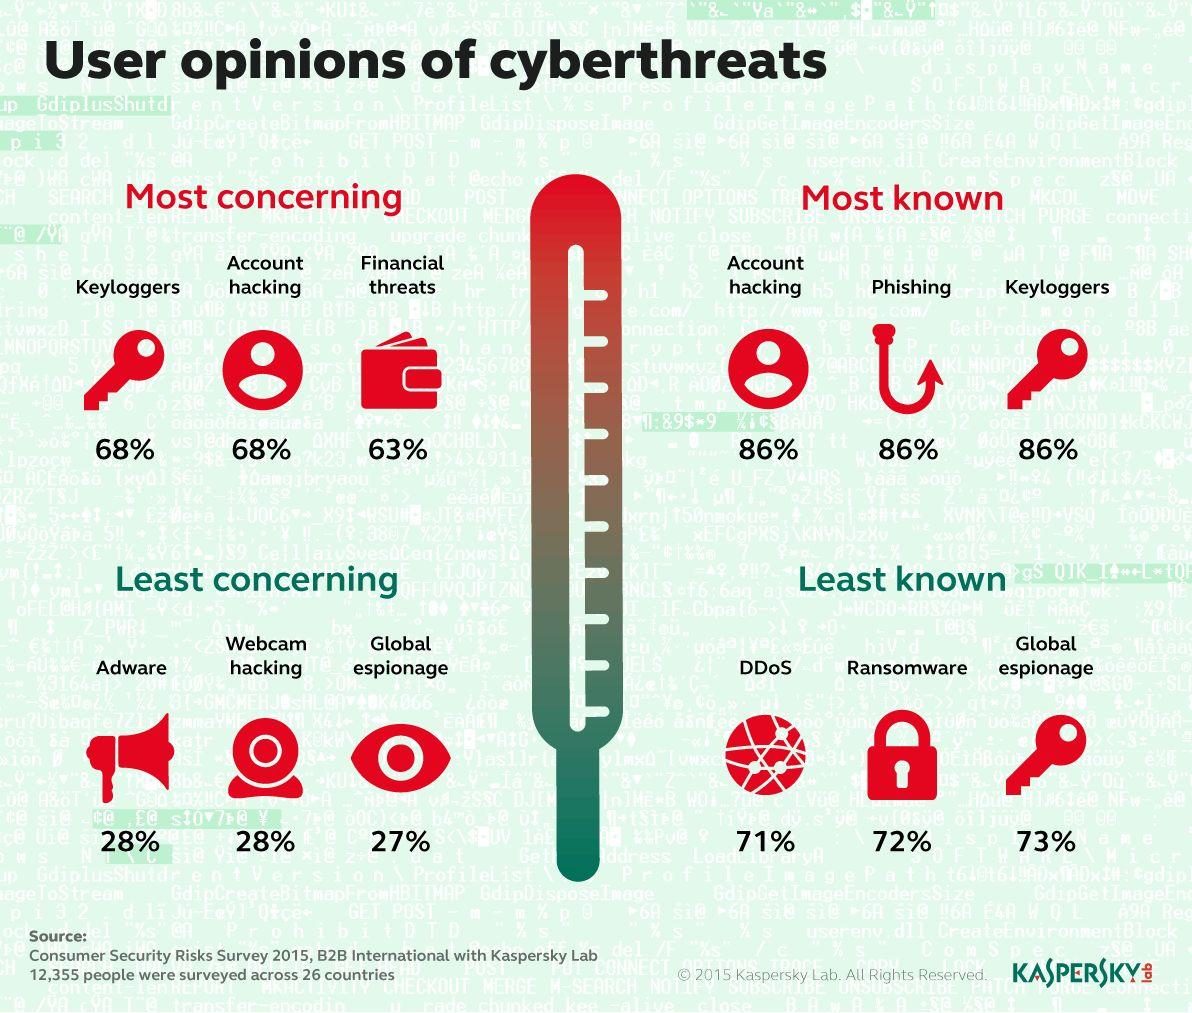 User Opinions of Cyberthreats